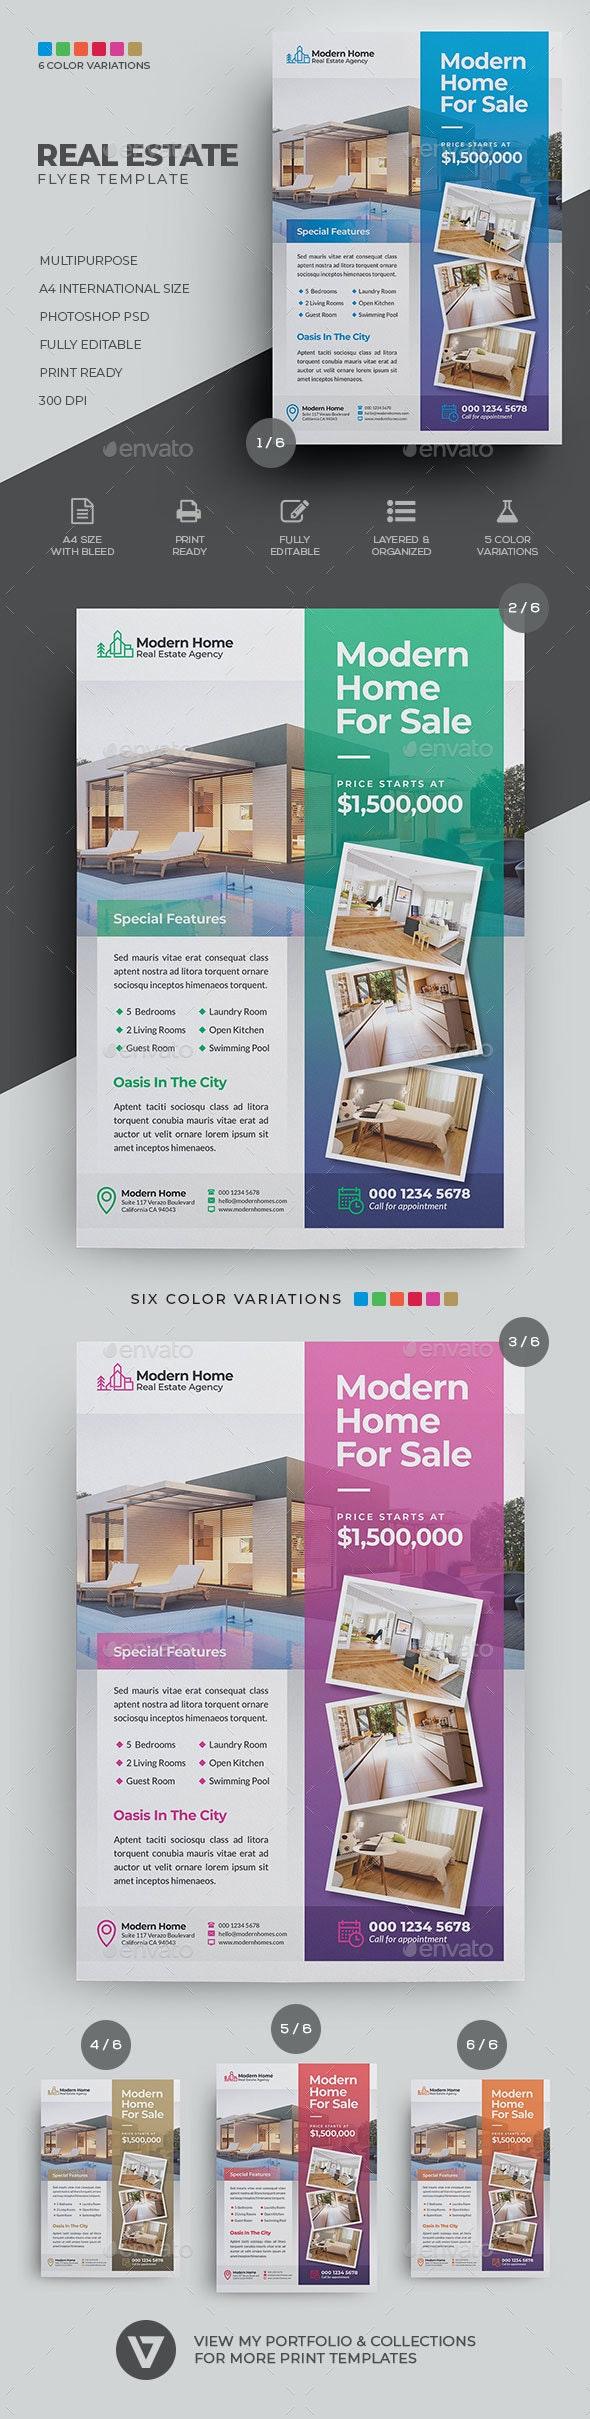 Real Estate Flyer - Commerce Flyers